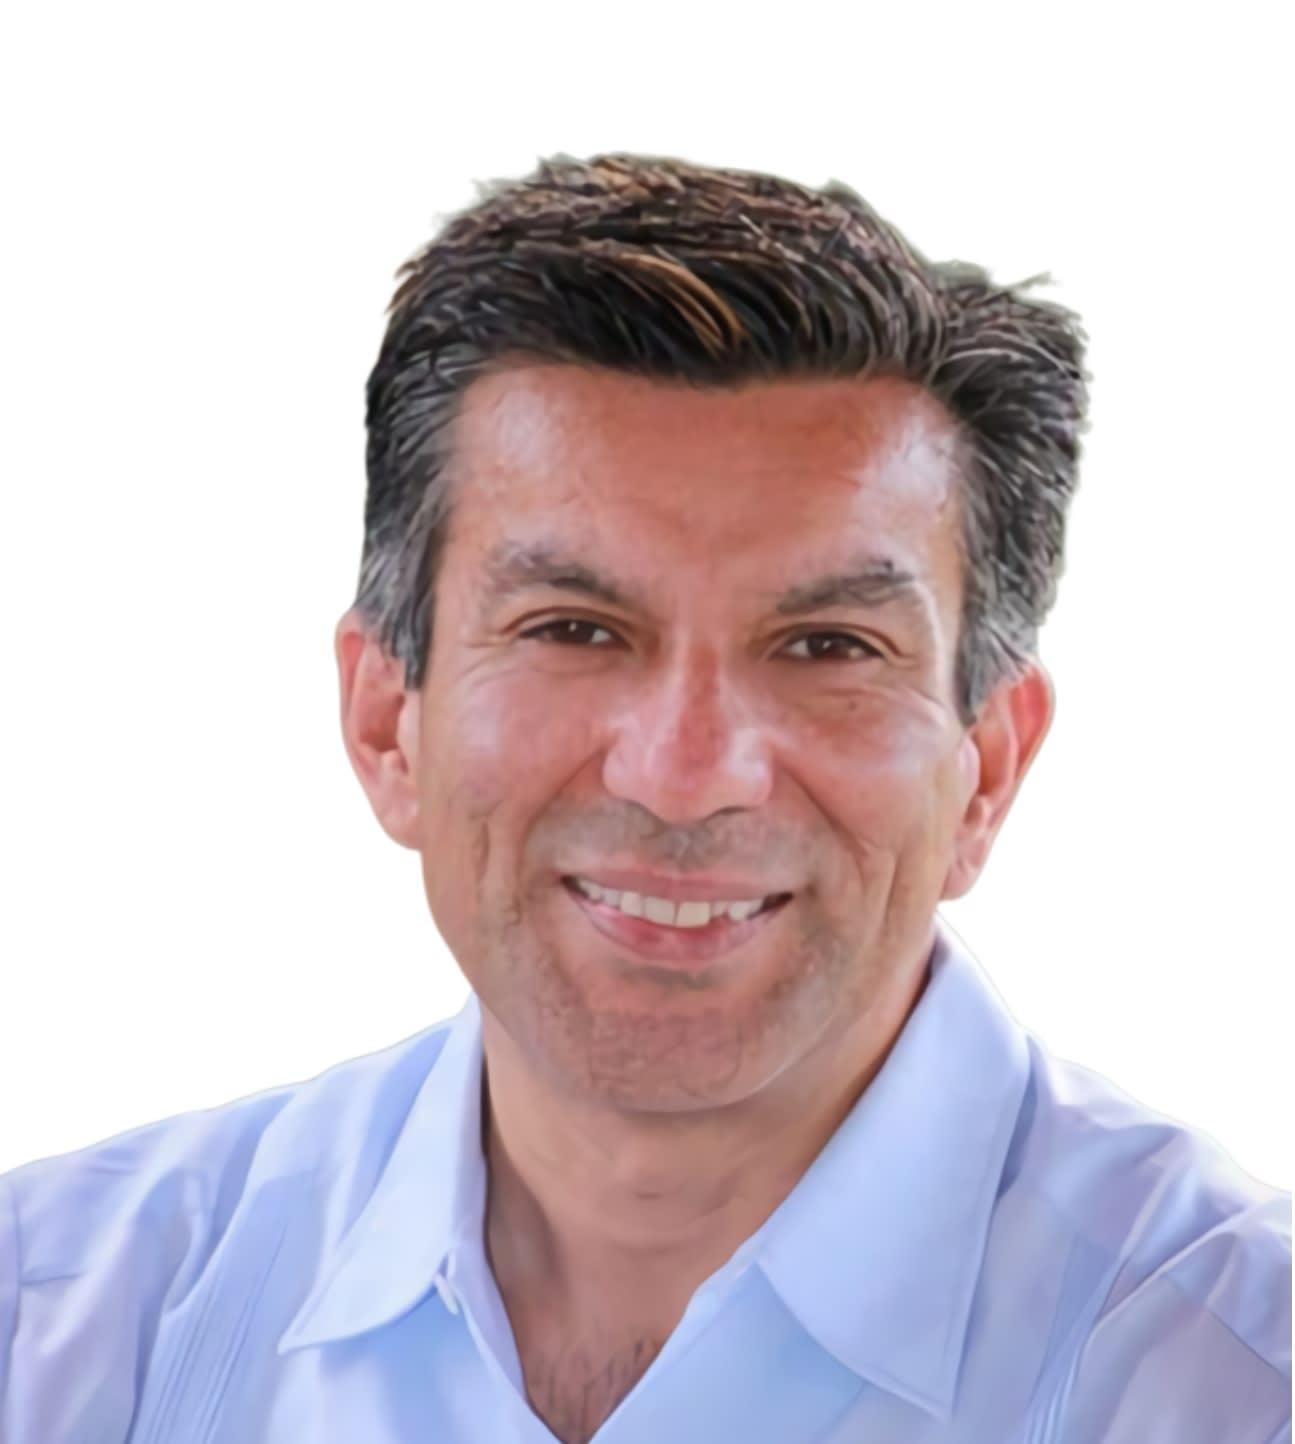 Alvaro Colindres